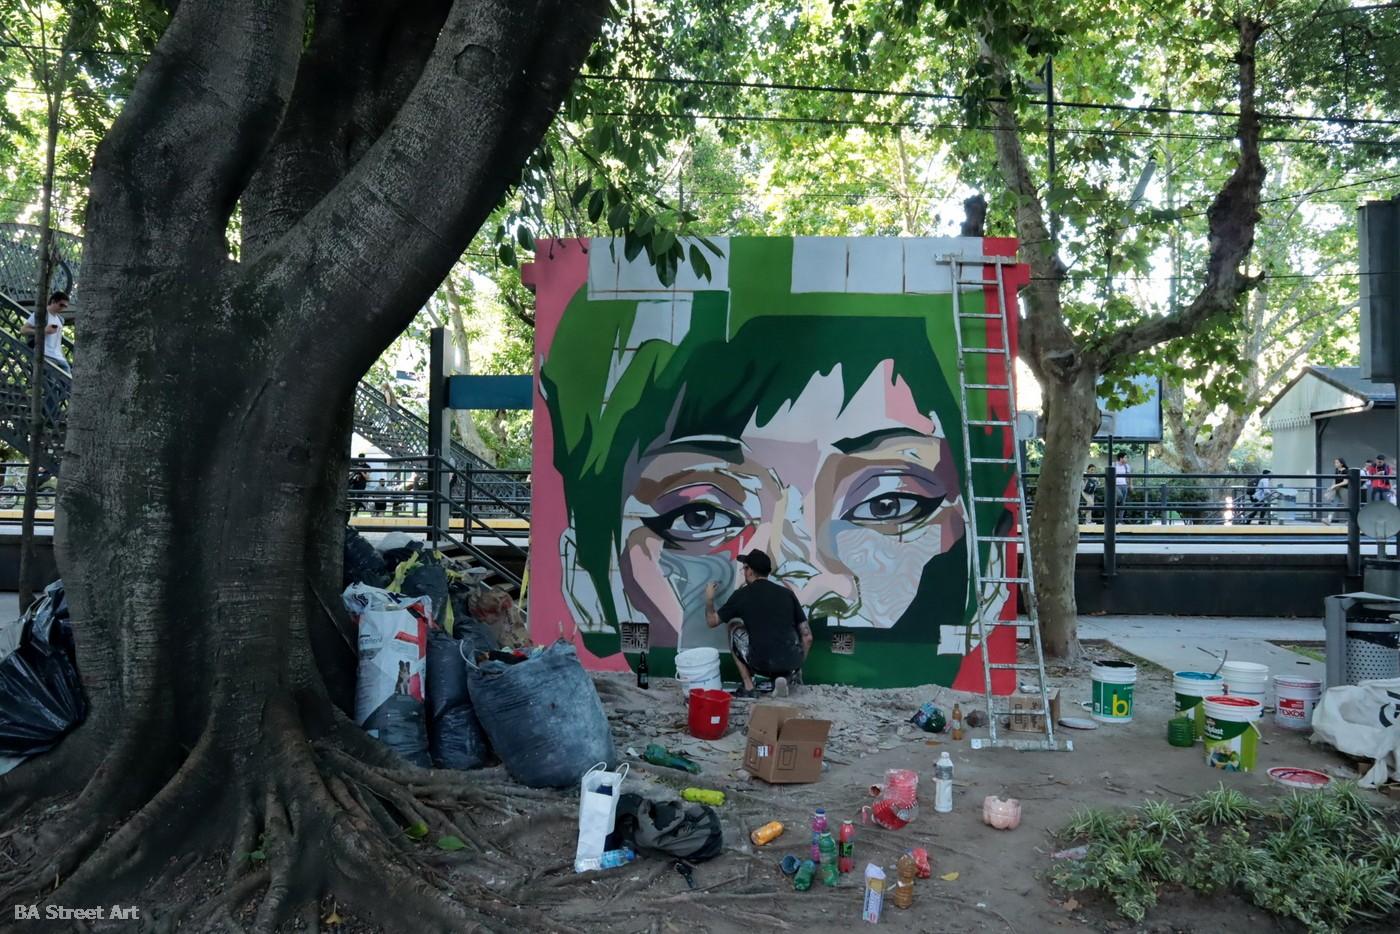 patxi mazzoni alonso artista muralist argentina buenos aires mujeres